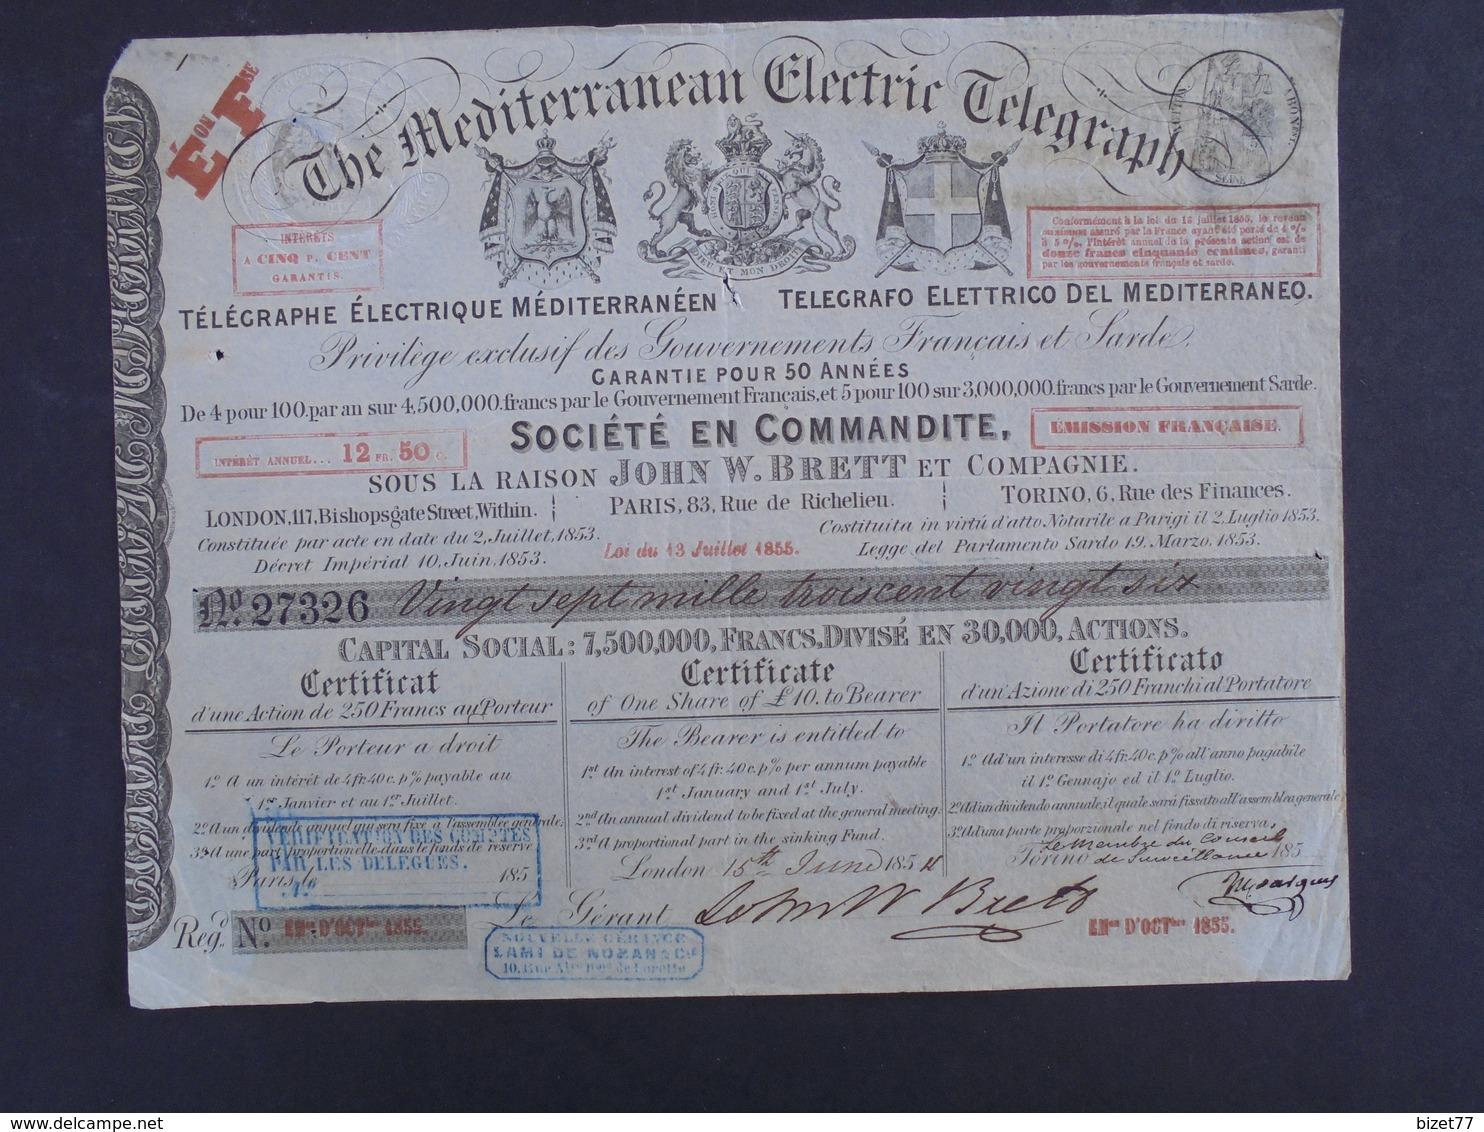 LONDRES 1854 - THE MDEITERRANEAN ELECTRIC TELEGRAPH - CERTIFICAT D'ACTION DE 10 £ - DECO - Shareholdings